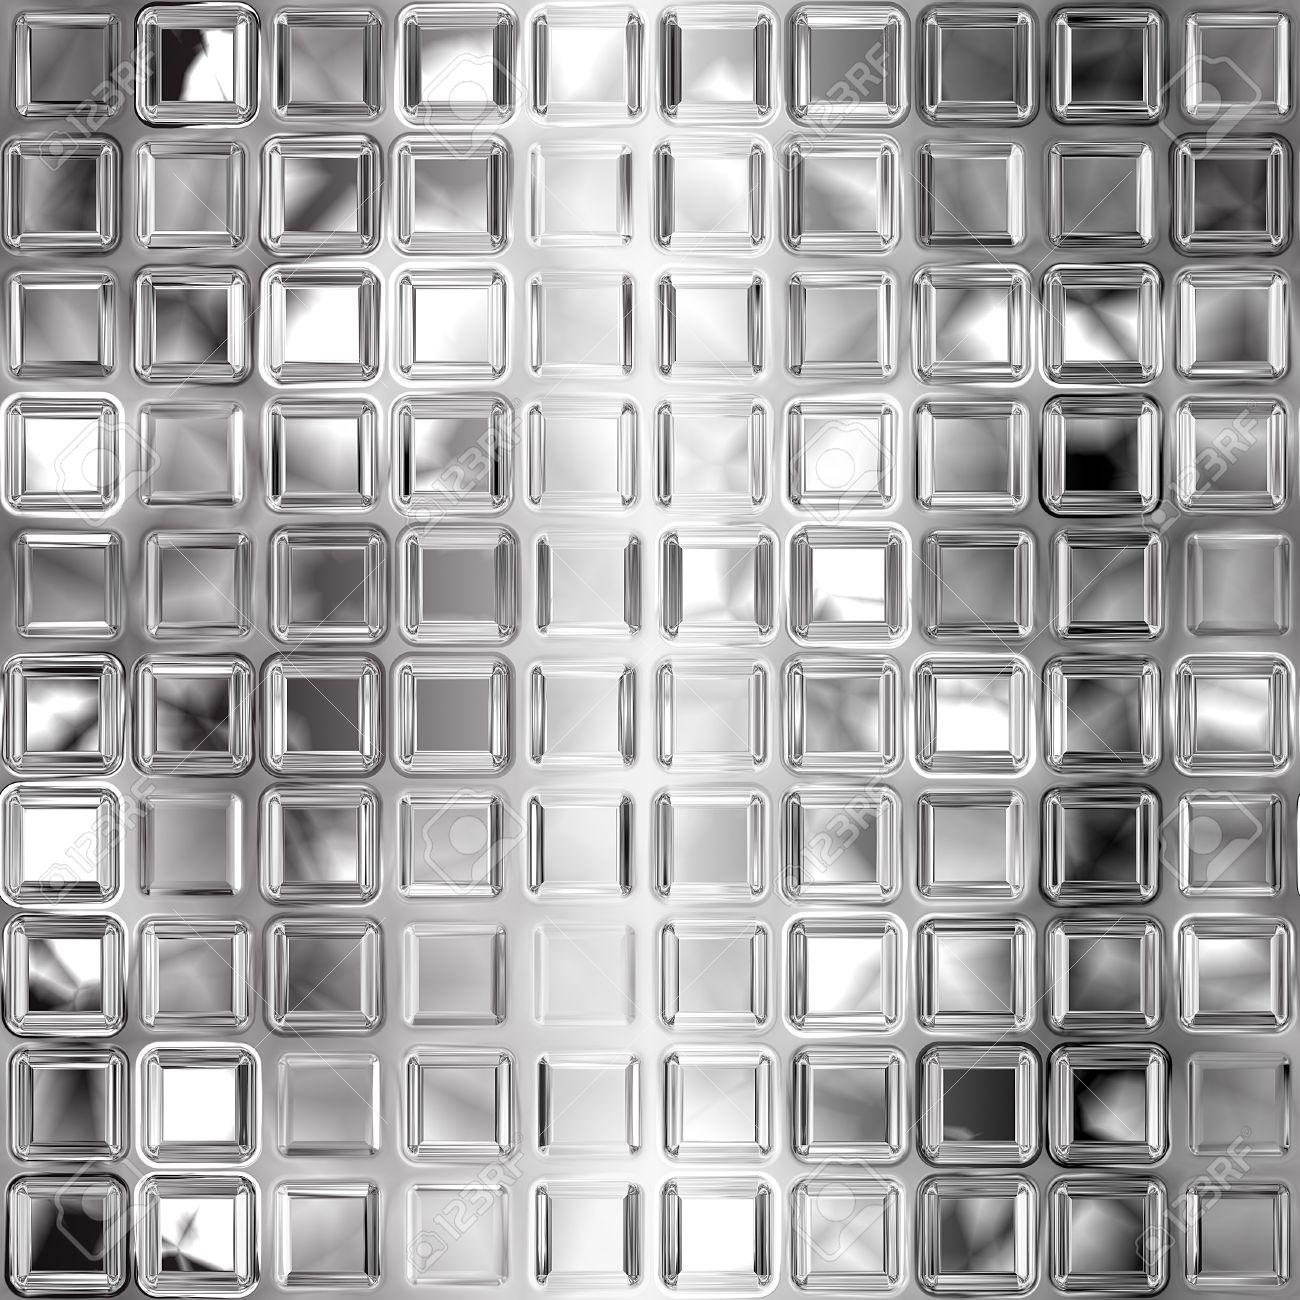 Seamless black and white glass tiles texture Stock Photo - 7450410